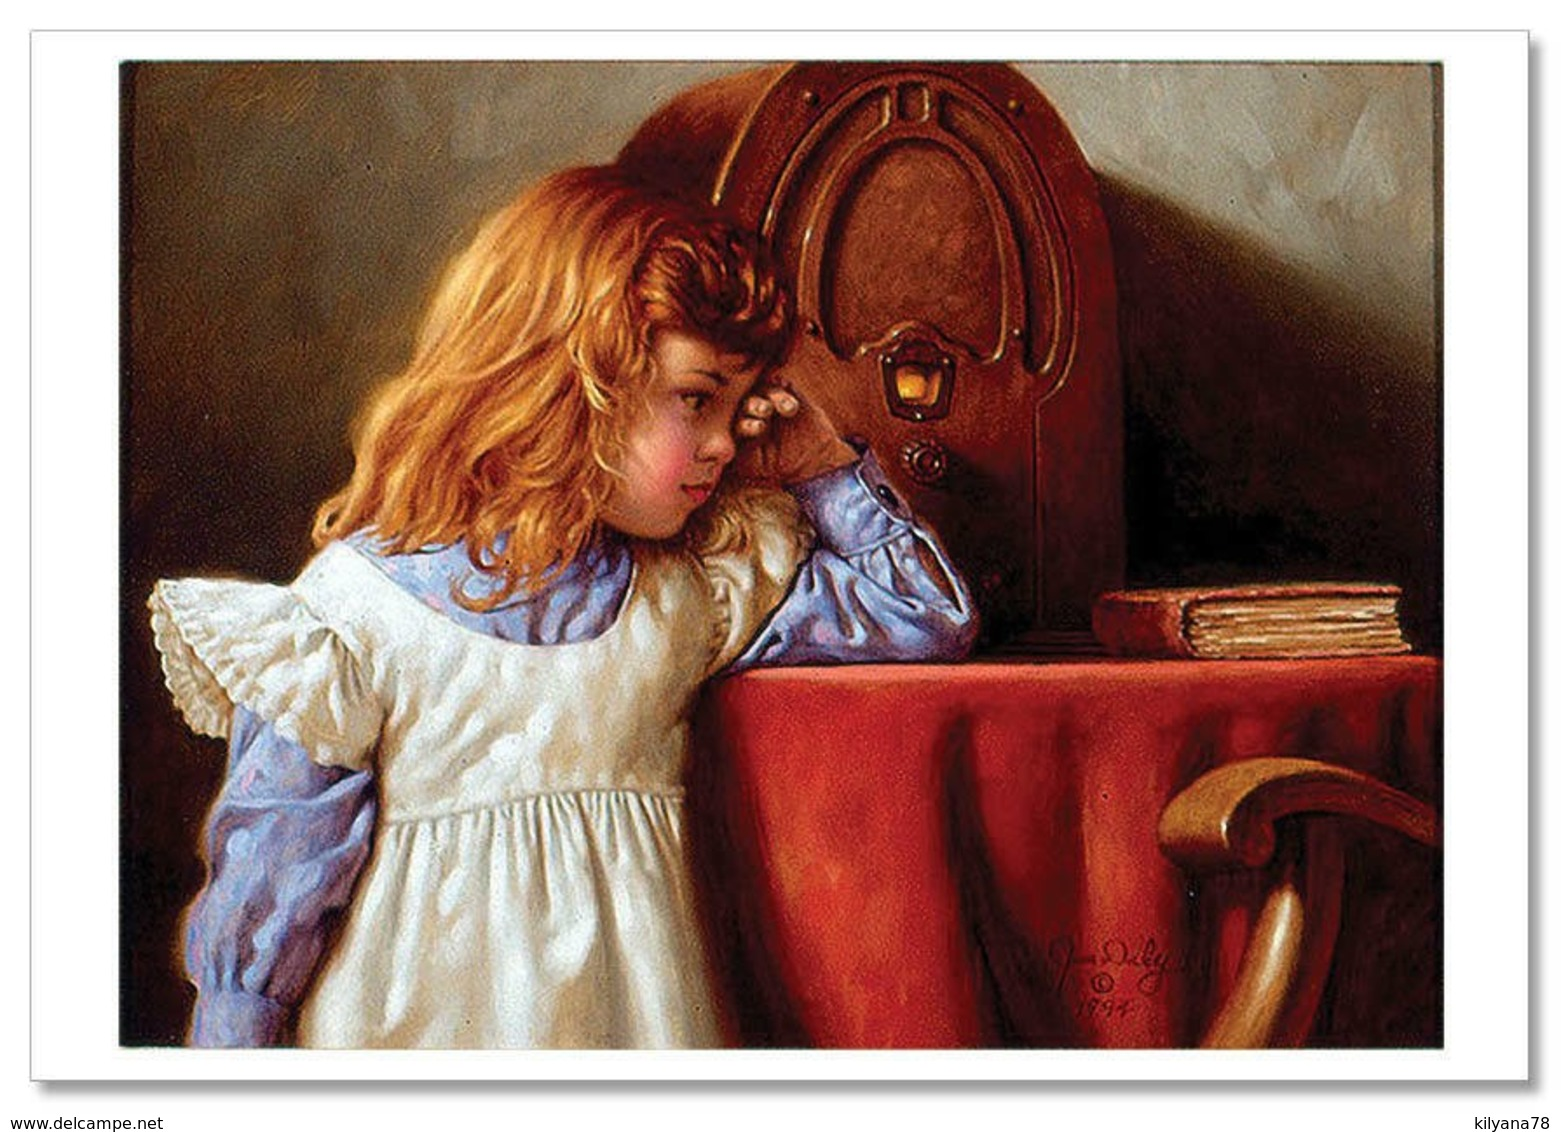 JIM DALY KIDS ~ LITTLE GIRL & BOOK Old Radio Table Tales  Art Modern Postcard - Children